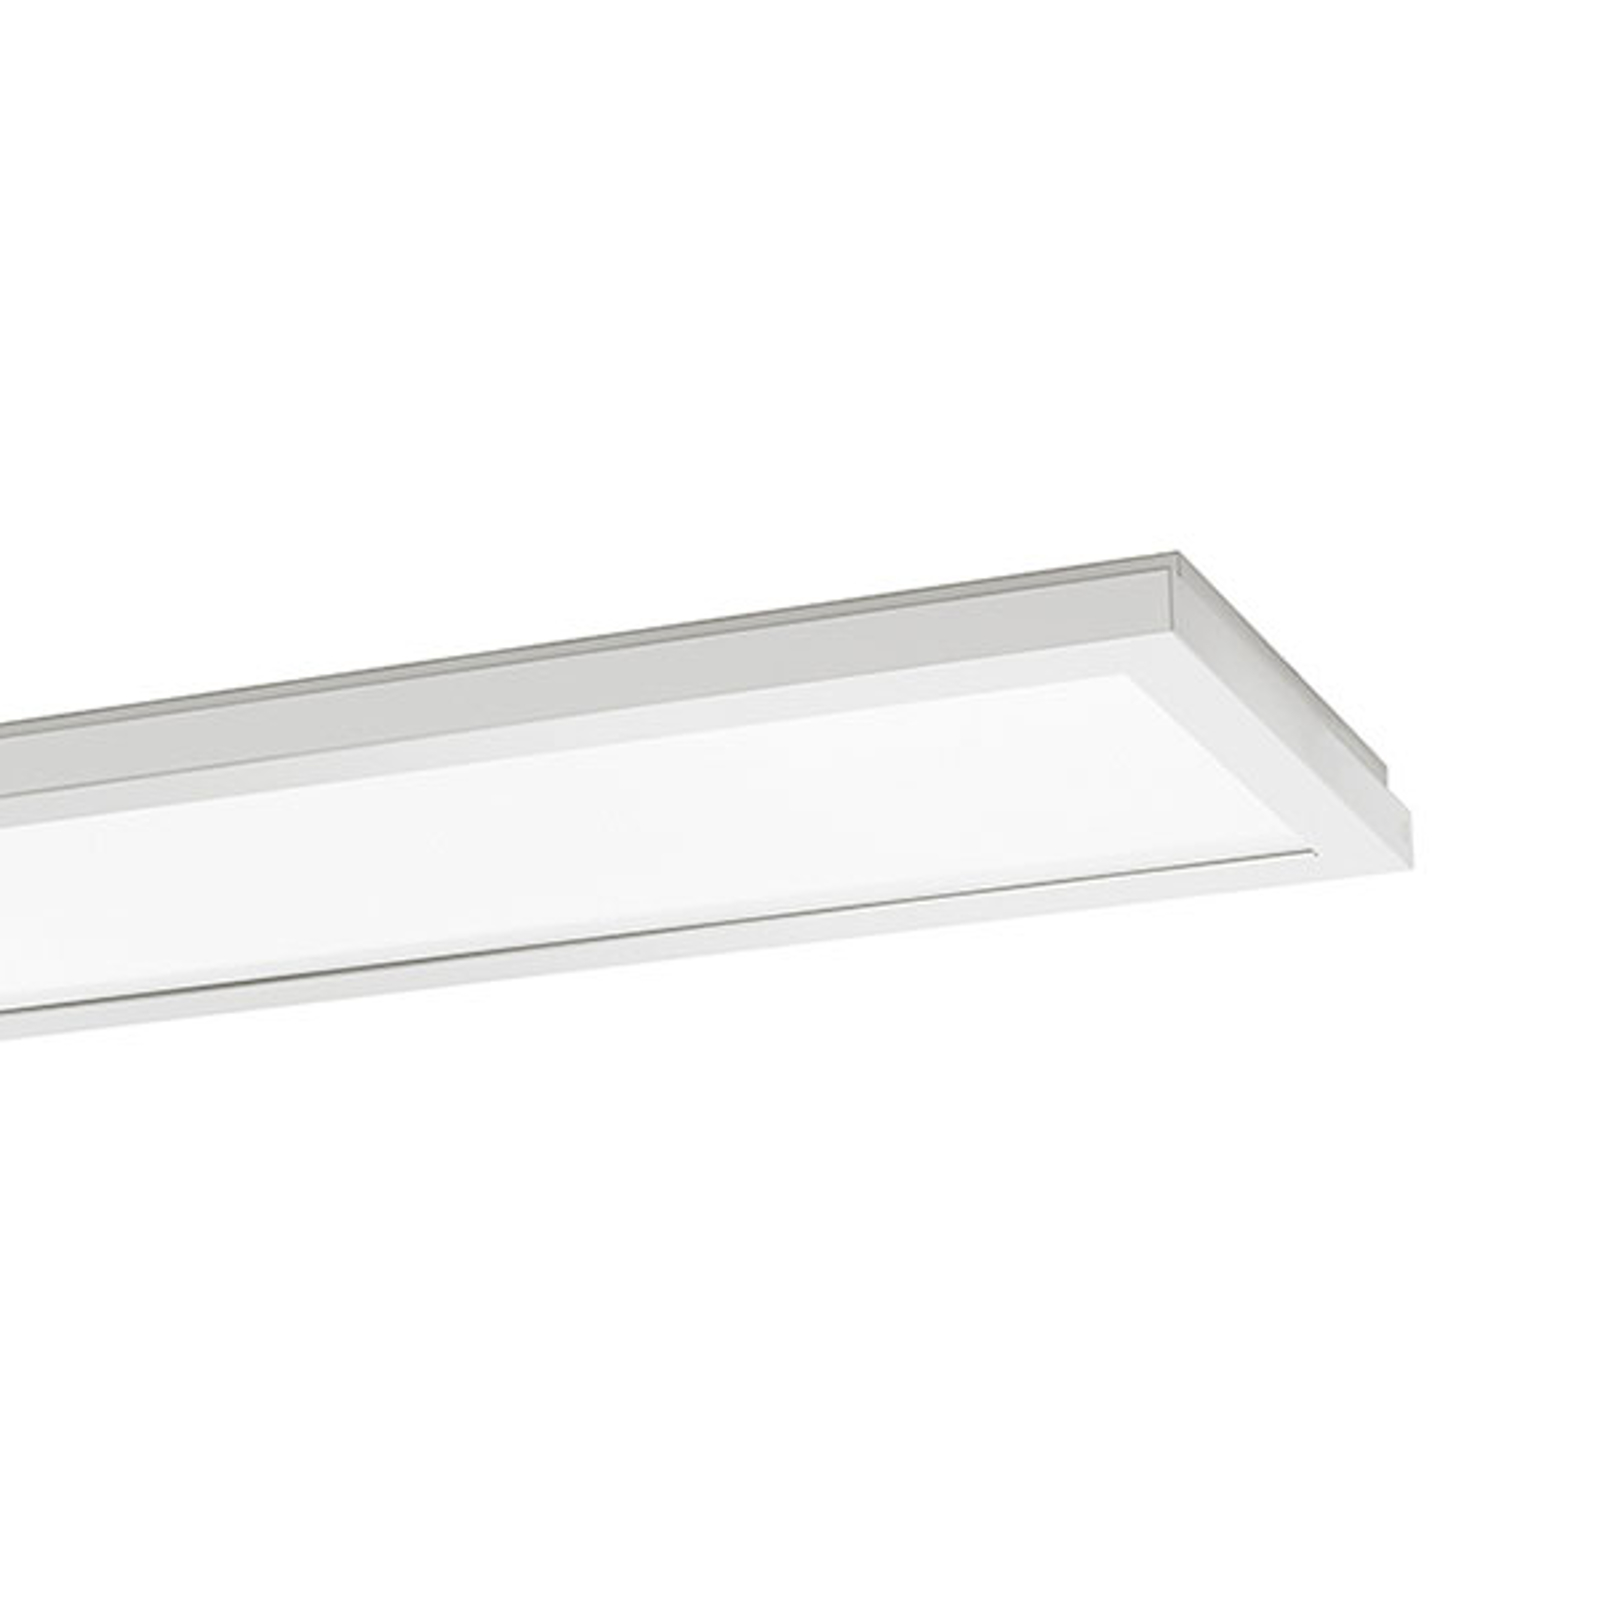 Plafondlamp SL630AB DALI+Touch 157cm wit 4.000K